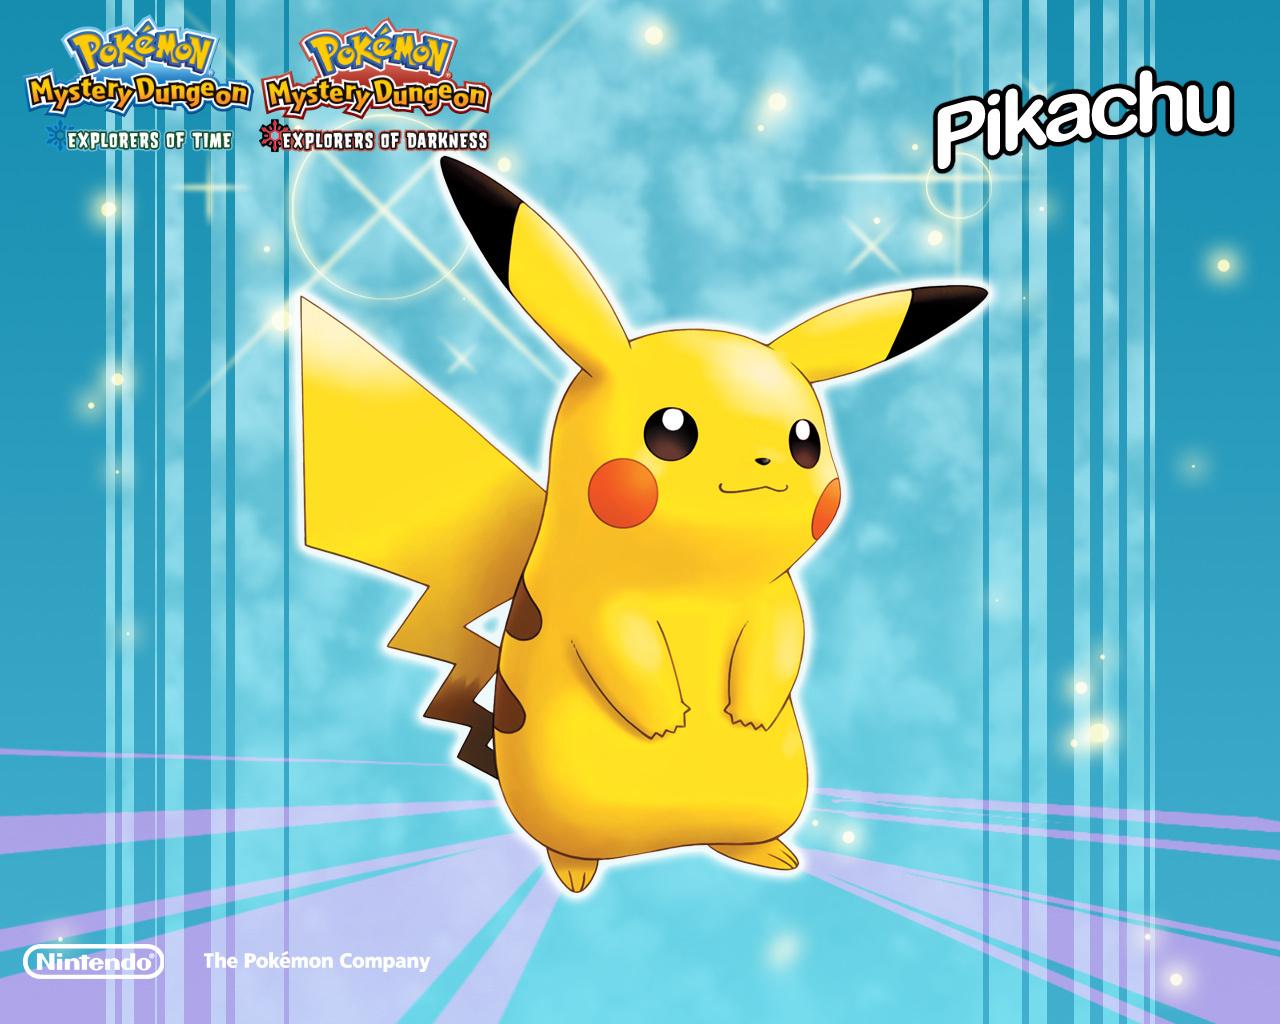 Pokemon Pictures 3 Desktop Background